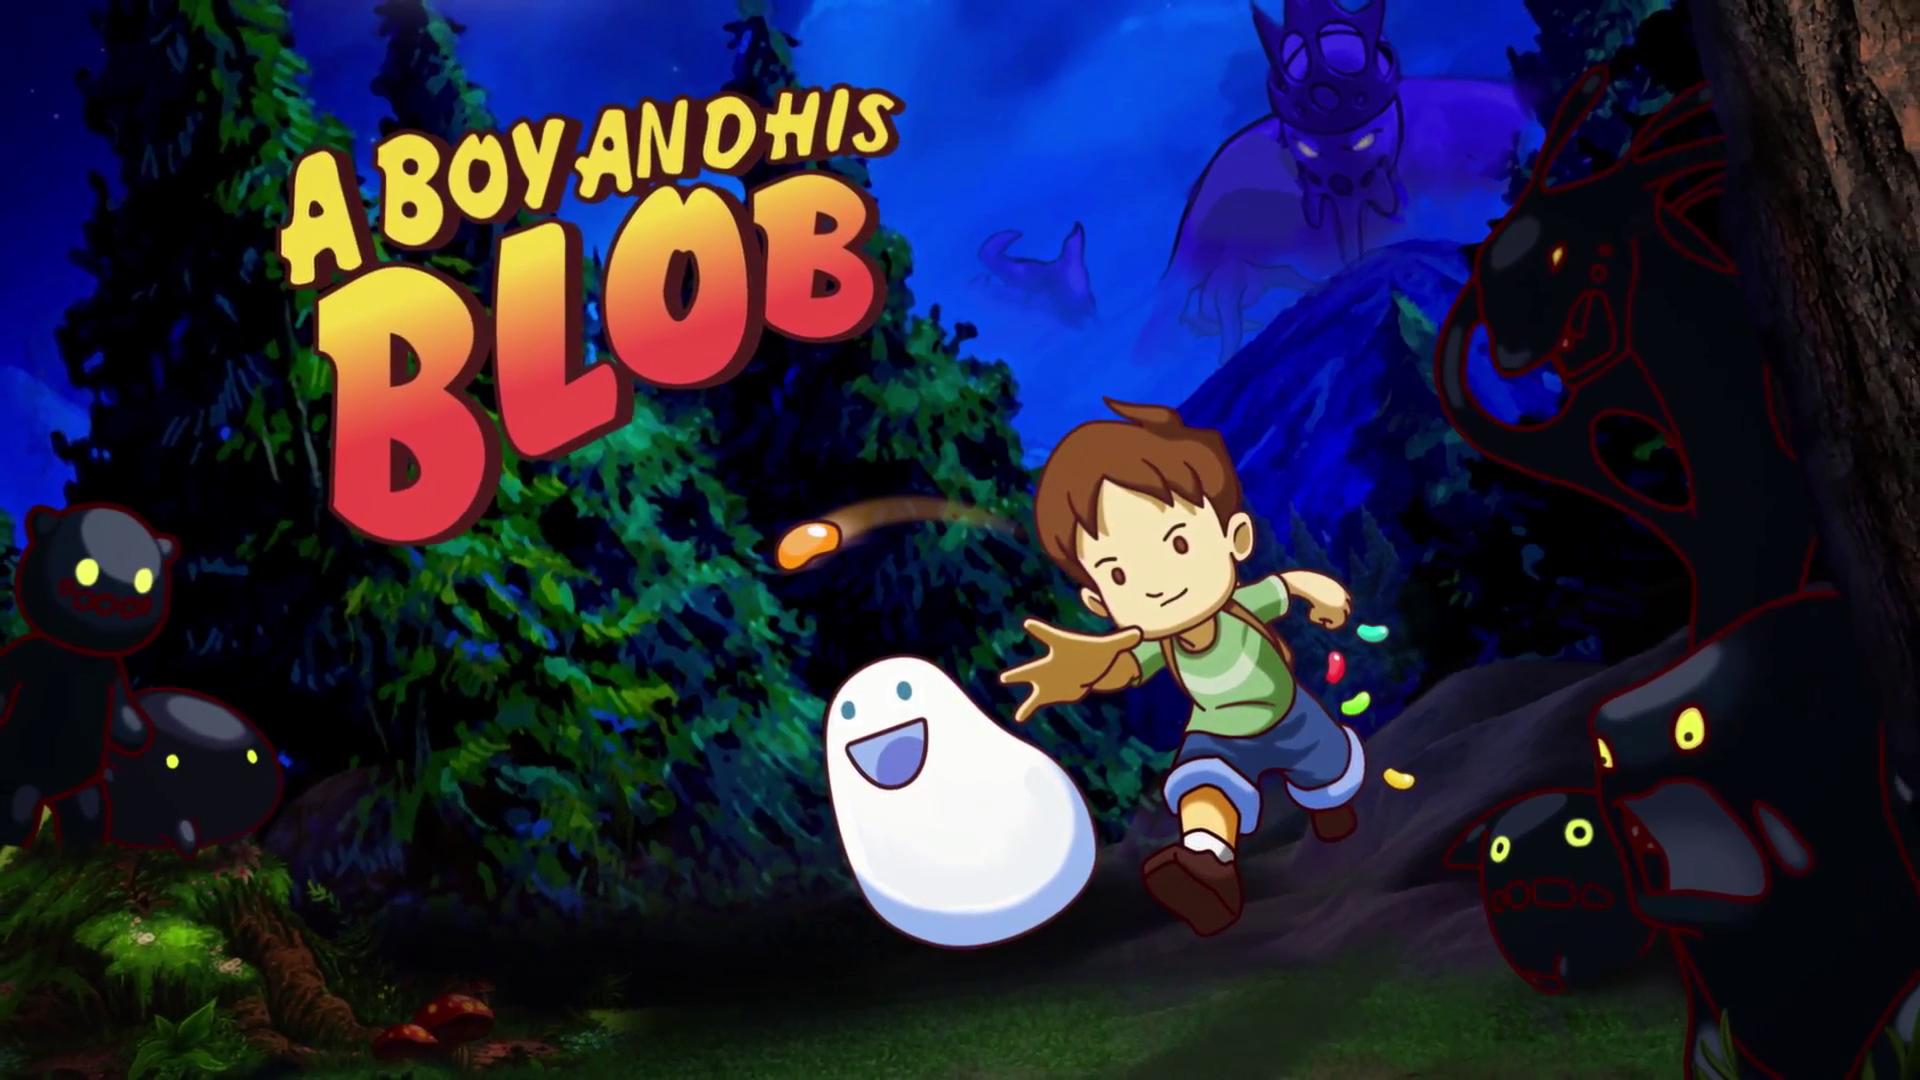 1452015433-a-boy-and-his-blob.jpg